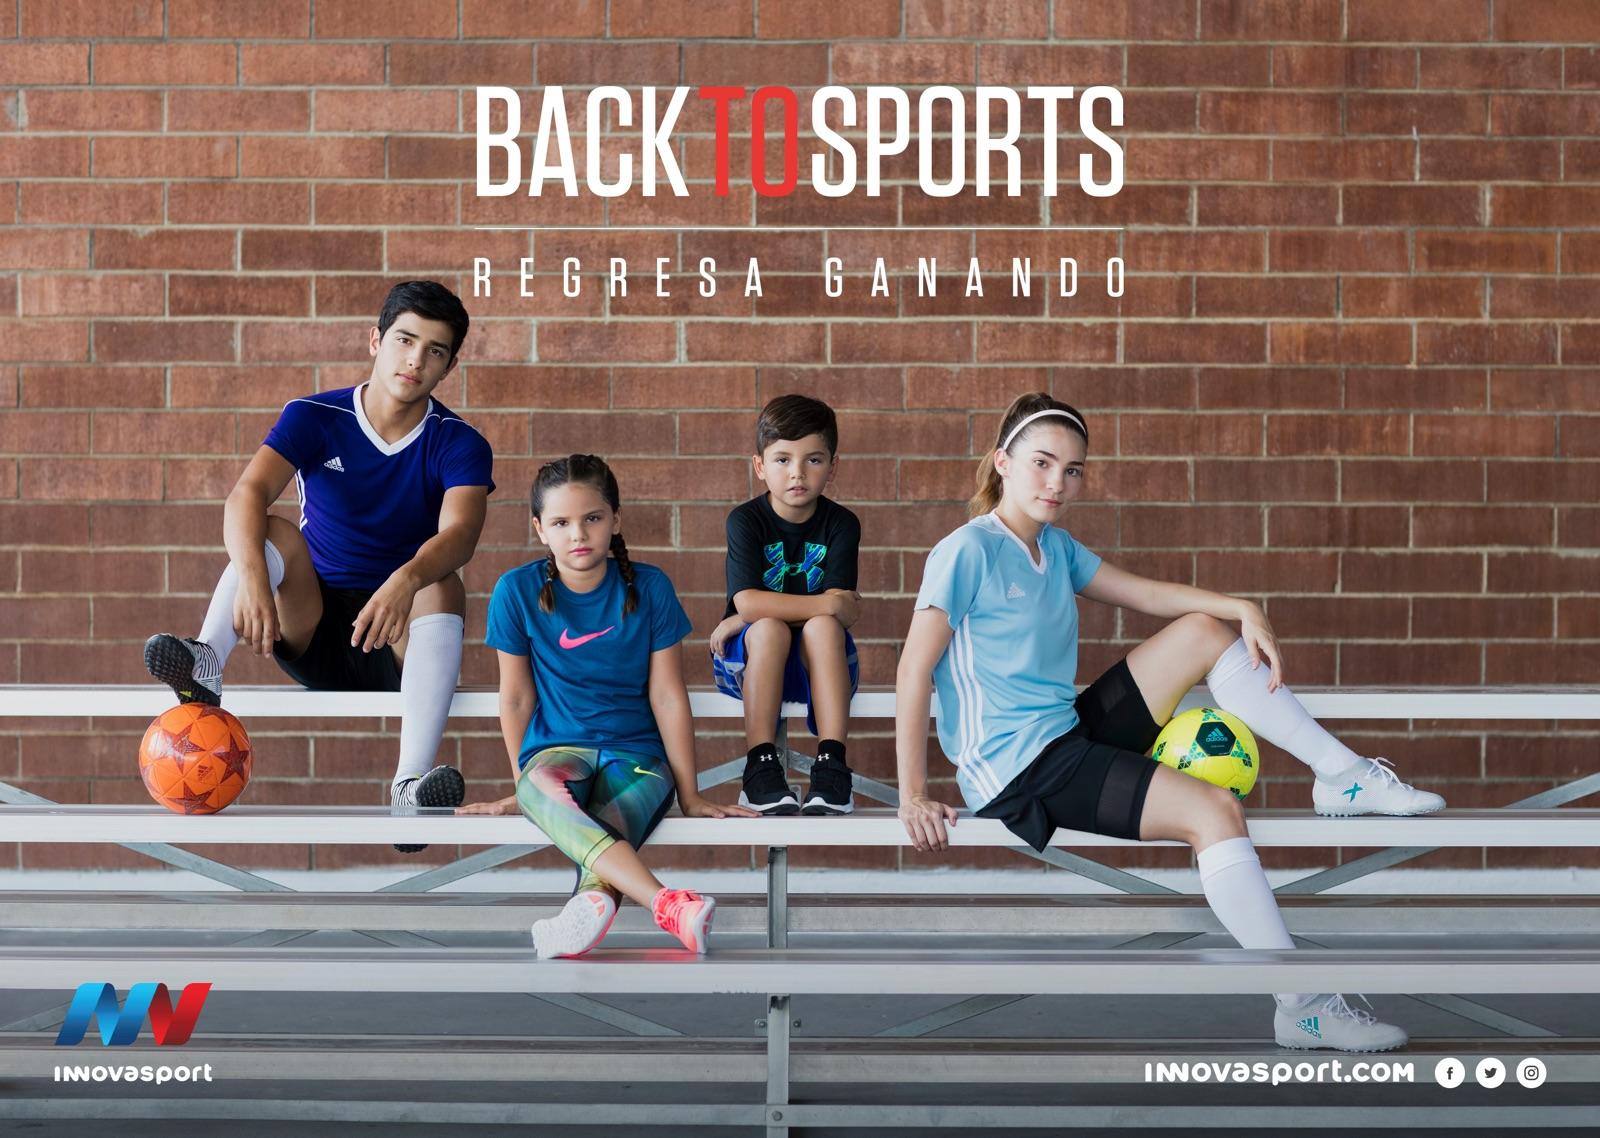 backtosports